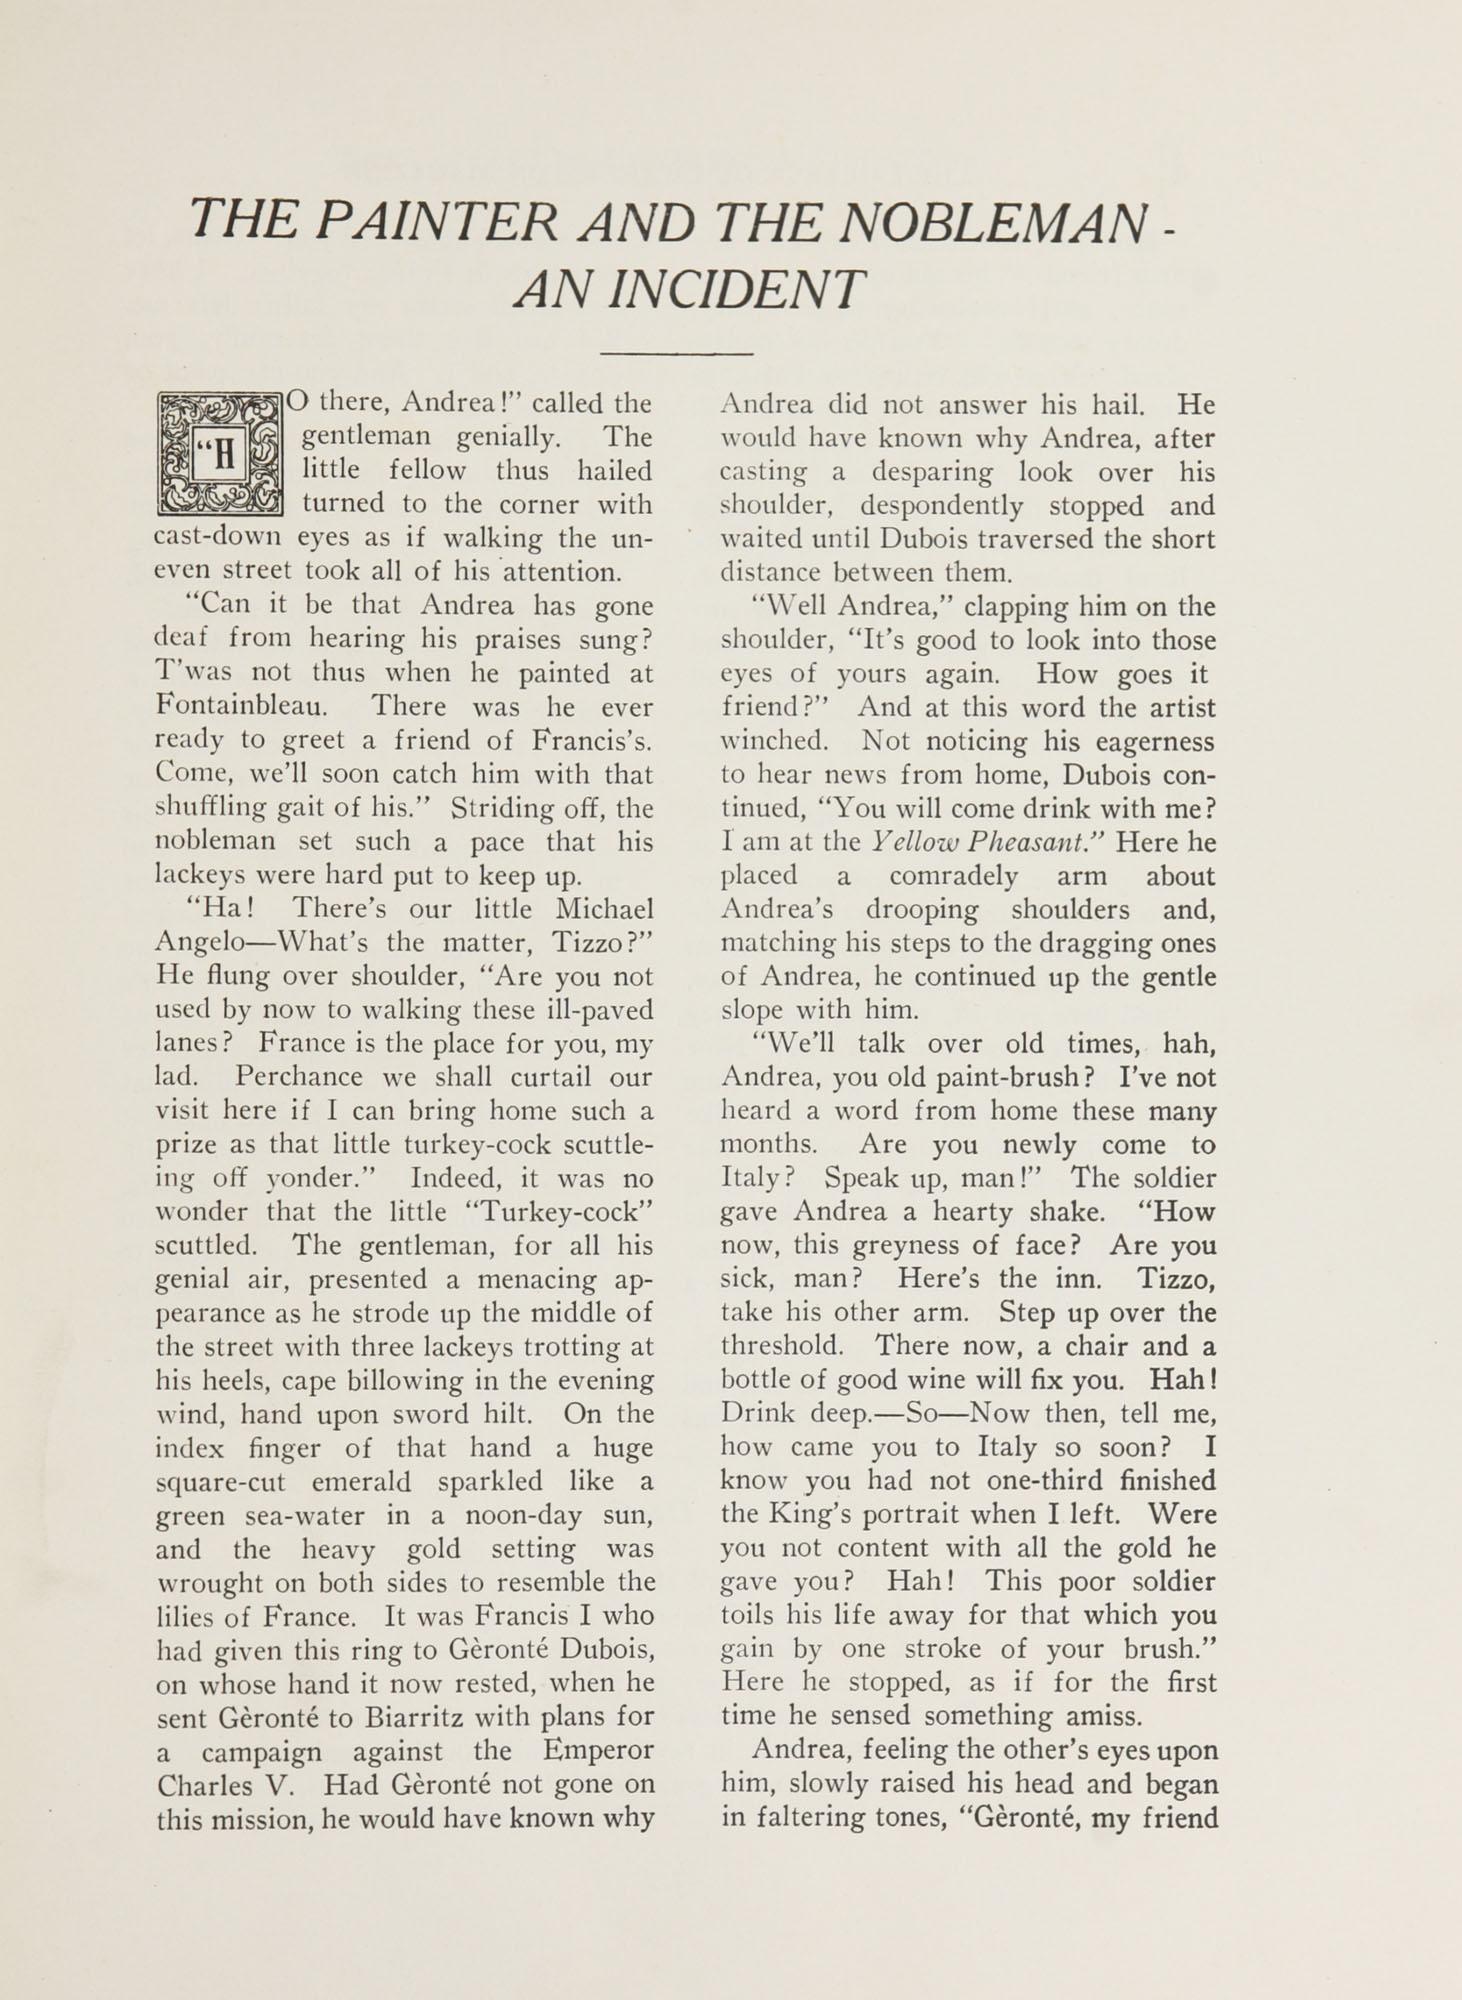 College of Charleston Magazine, 1937-1938, Vol. XXXXI No. 2, page 3